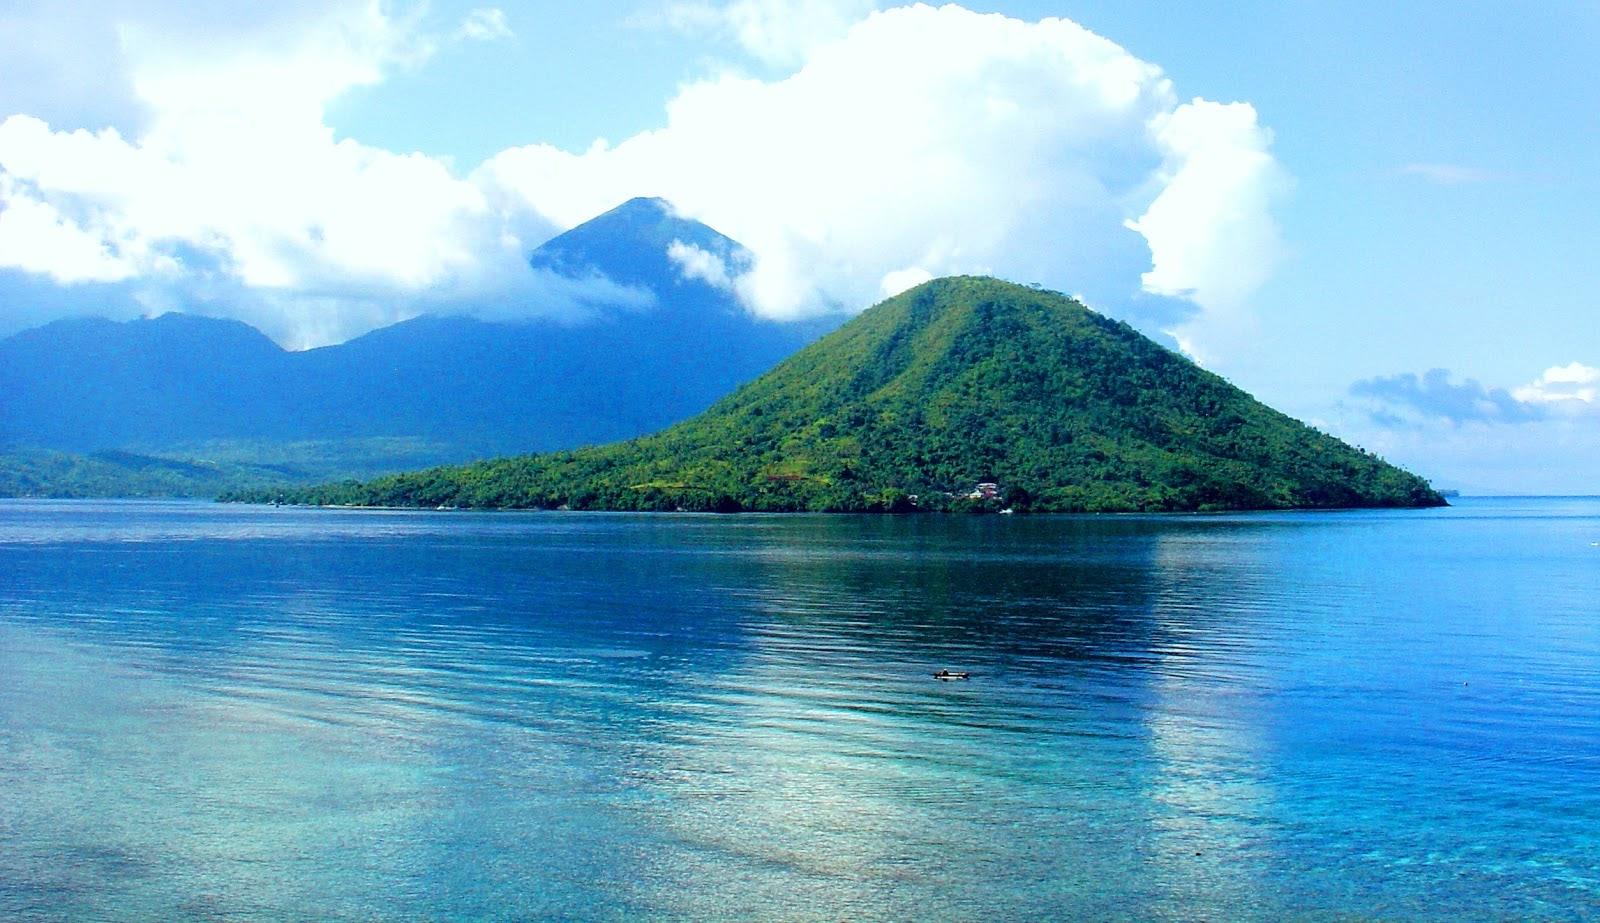 wisata maluku pulau maitara